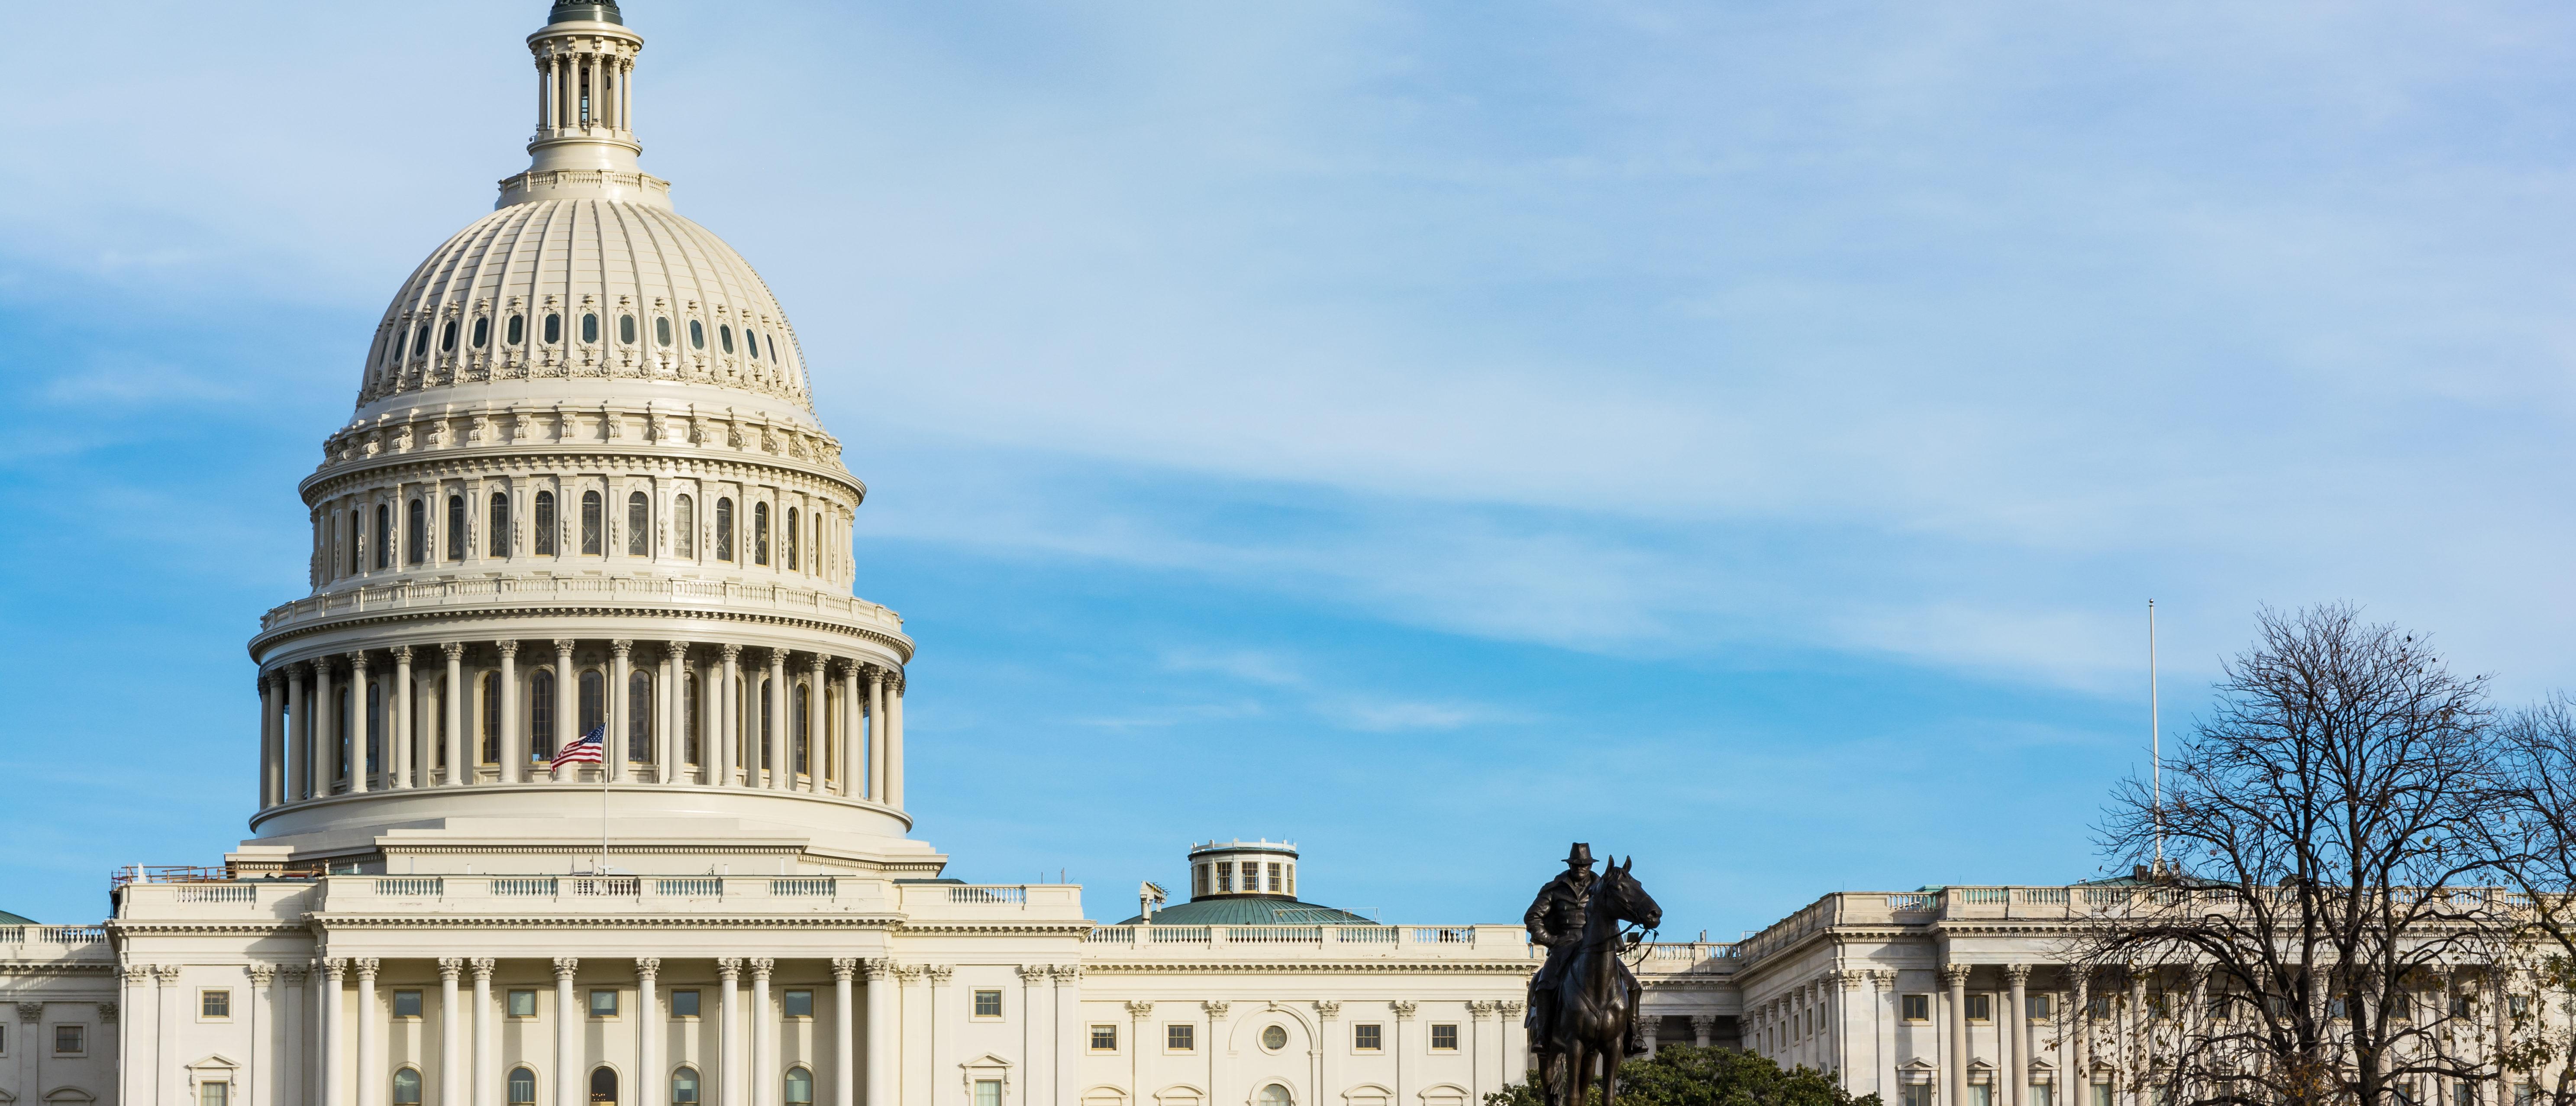 Capitol Building Shutterstock